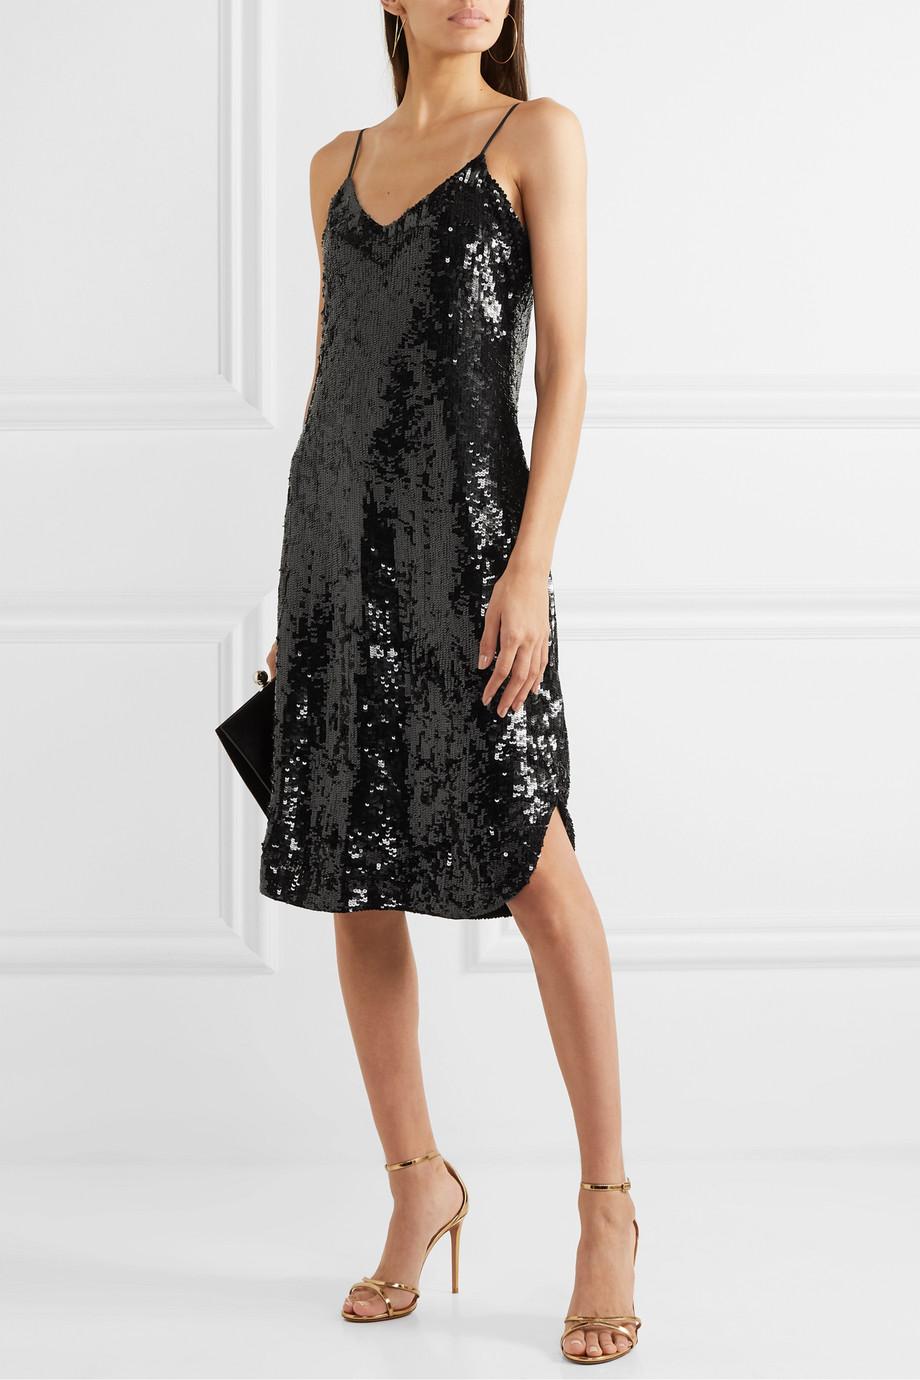 Nili Lotan Kleid aus Chiffon mit Pailletten